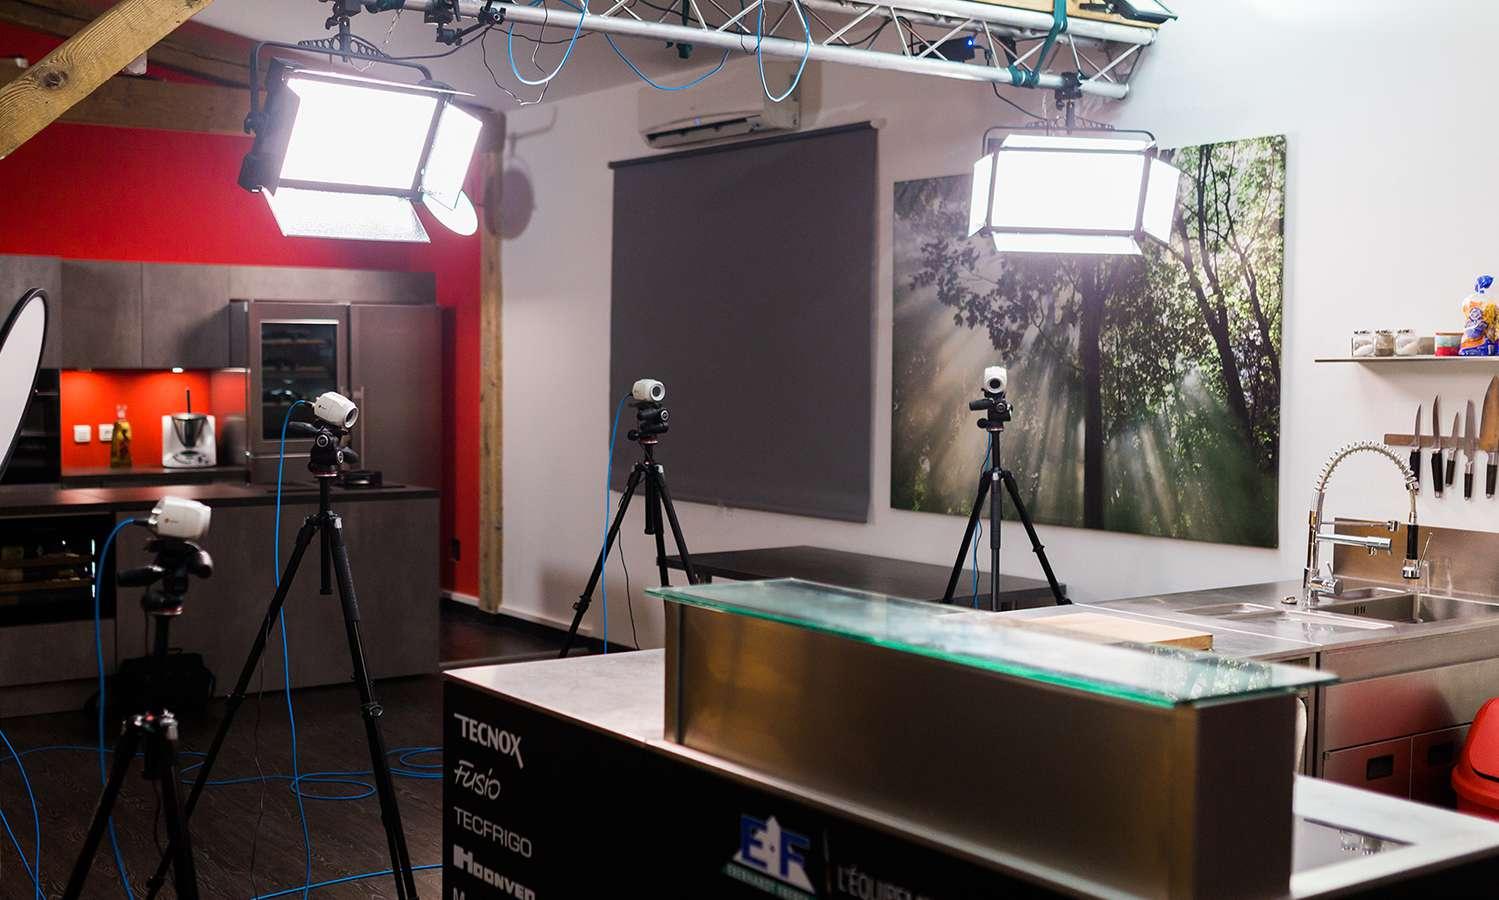 Studio tv cuisine professionnelle for Reglementation cuisine professionnelle